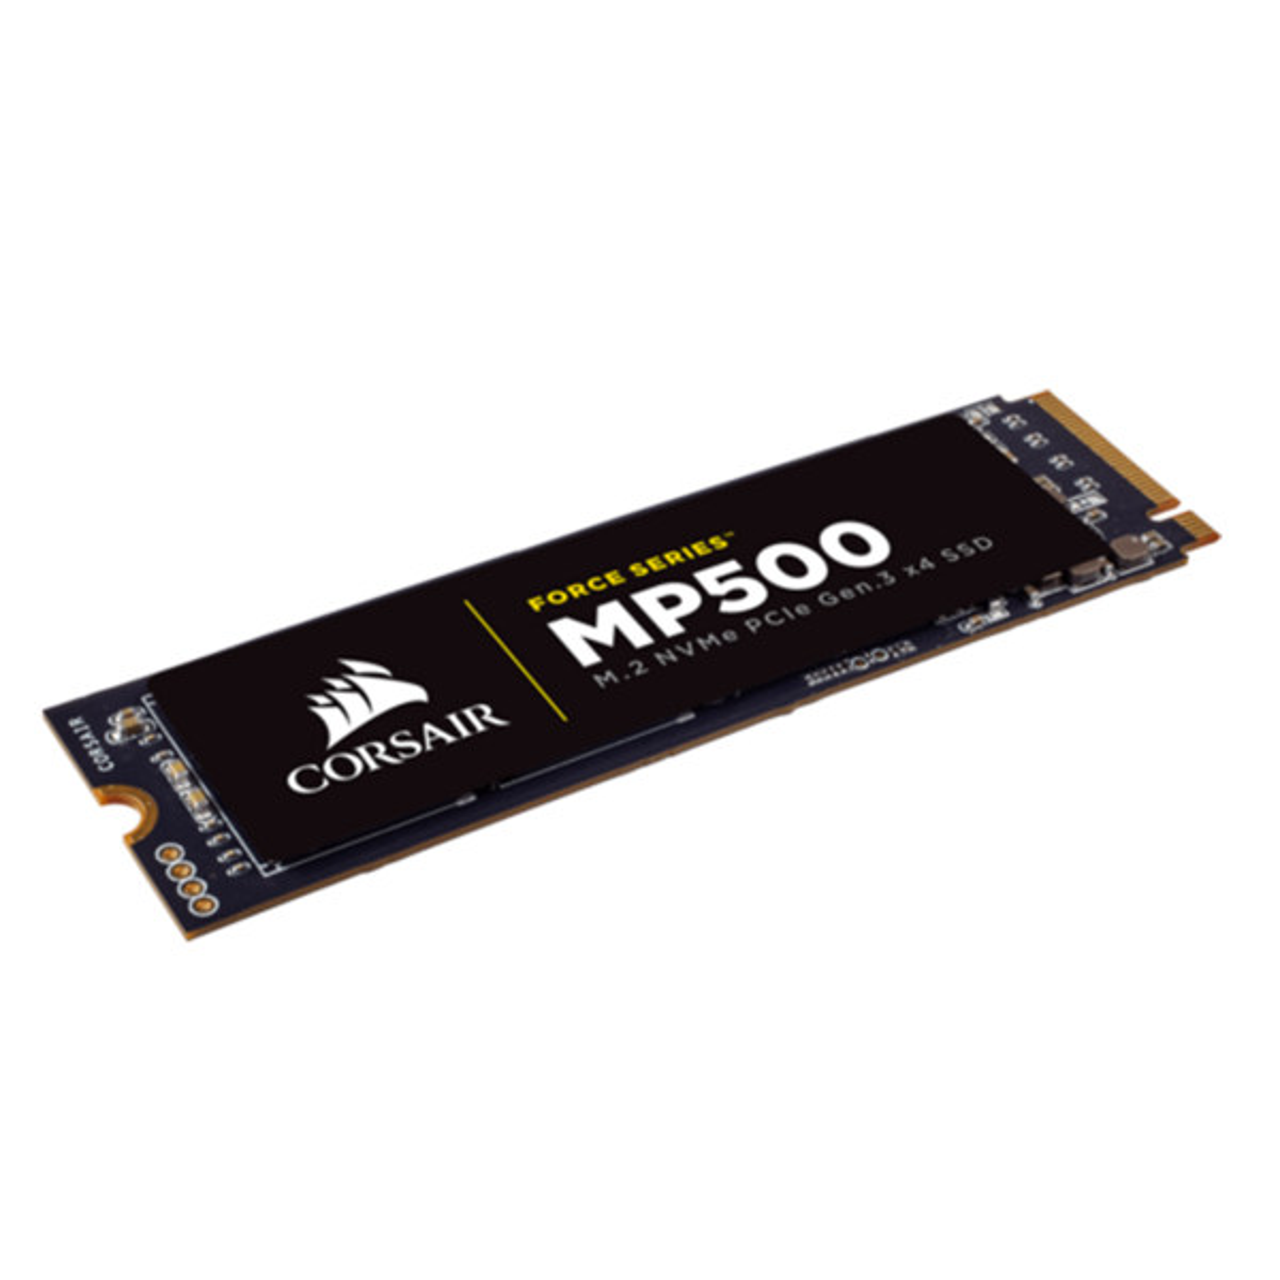 اس اس دی کورسیر مدل Force Series MP500 ظرفیت 240 گیگابایت